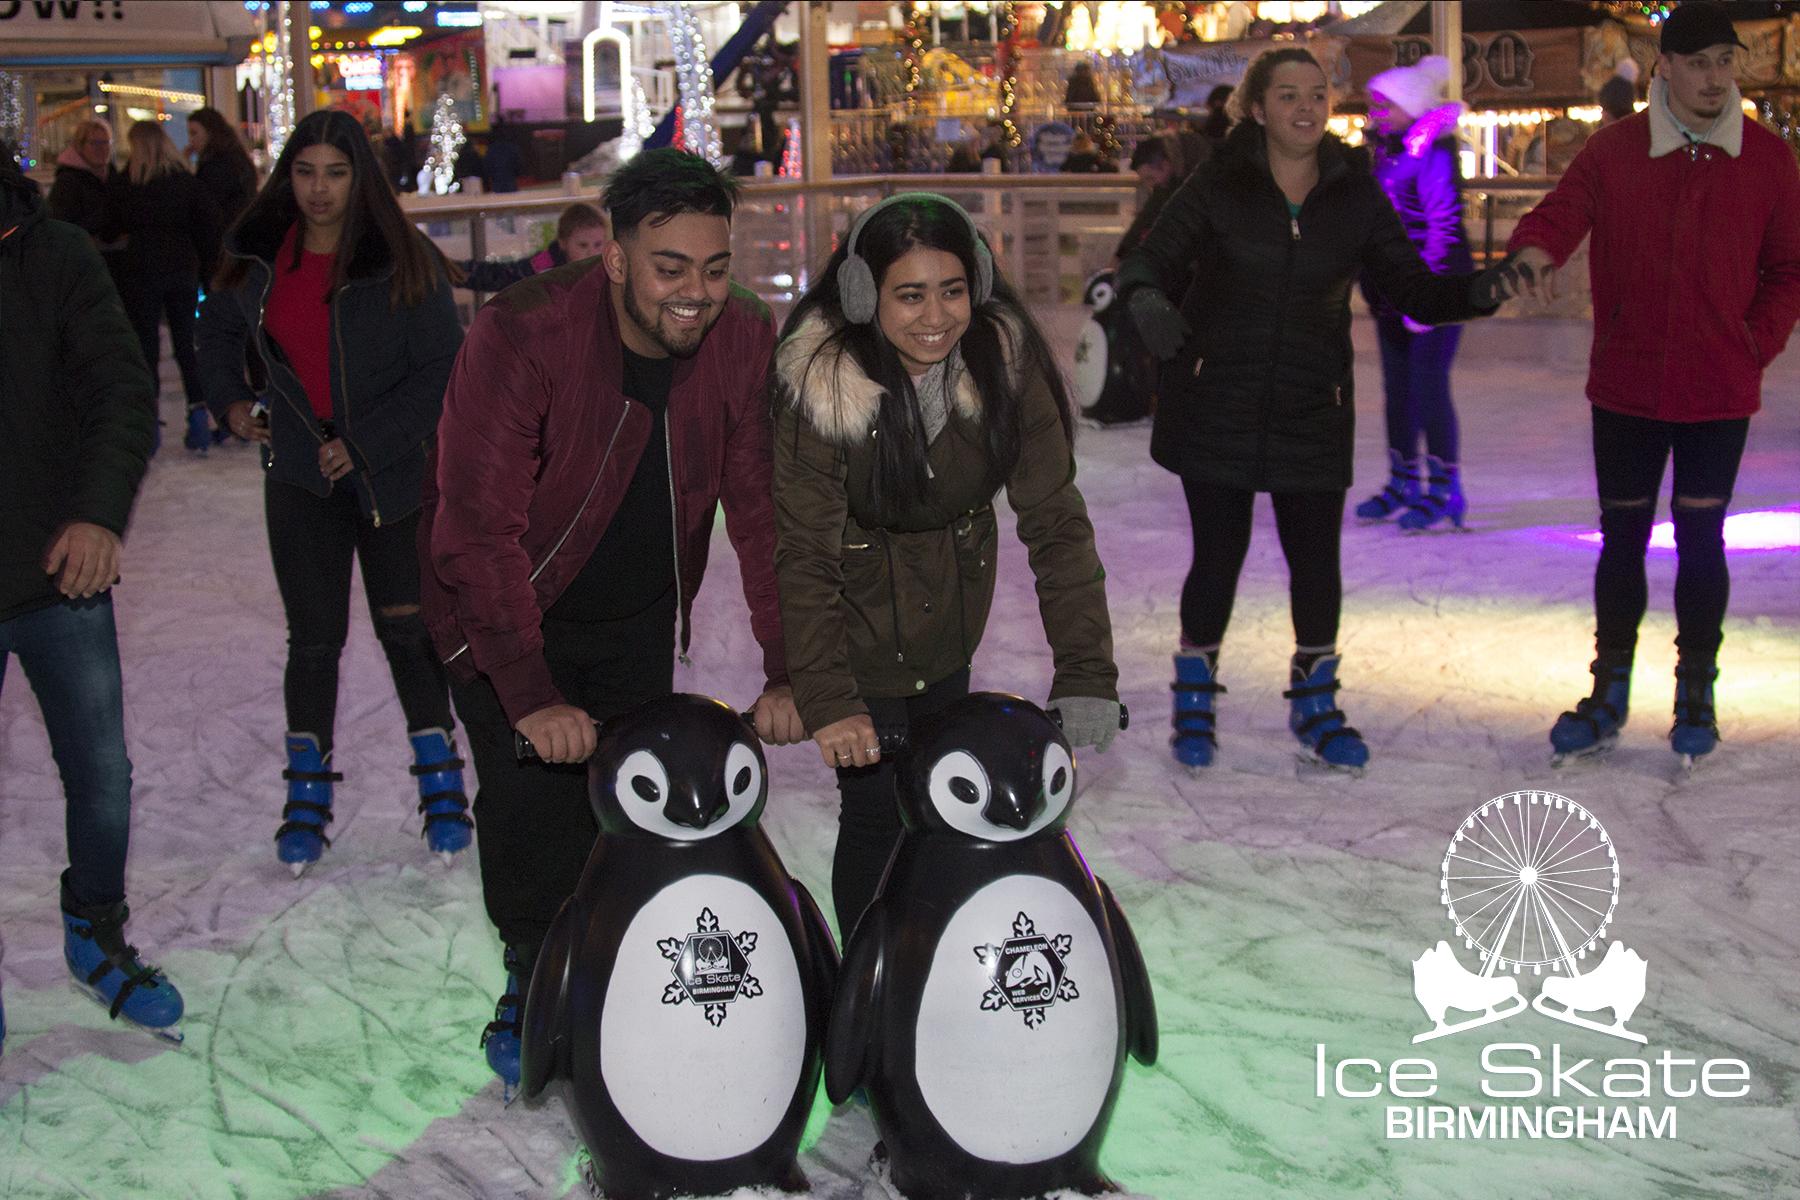 Ice Skate Birmingham 14 12 2017 (18)